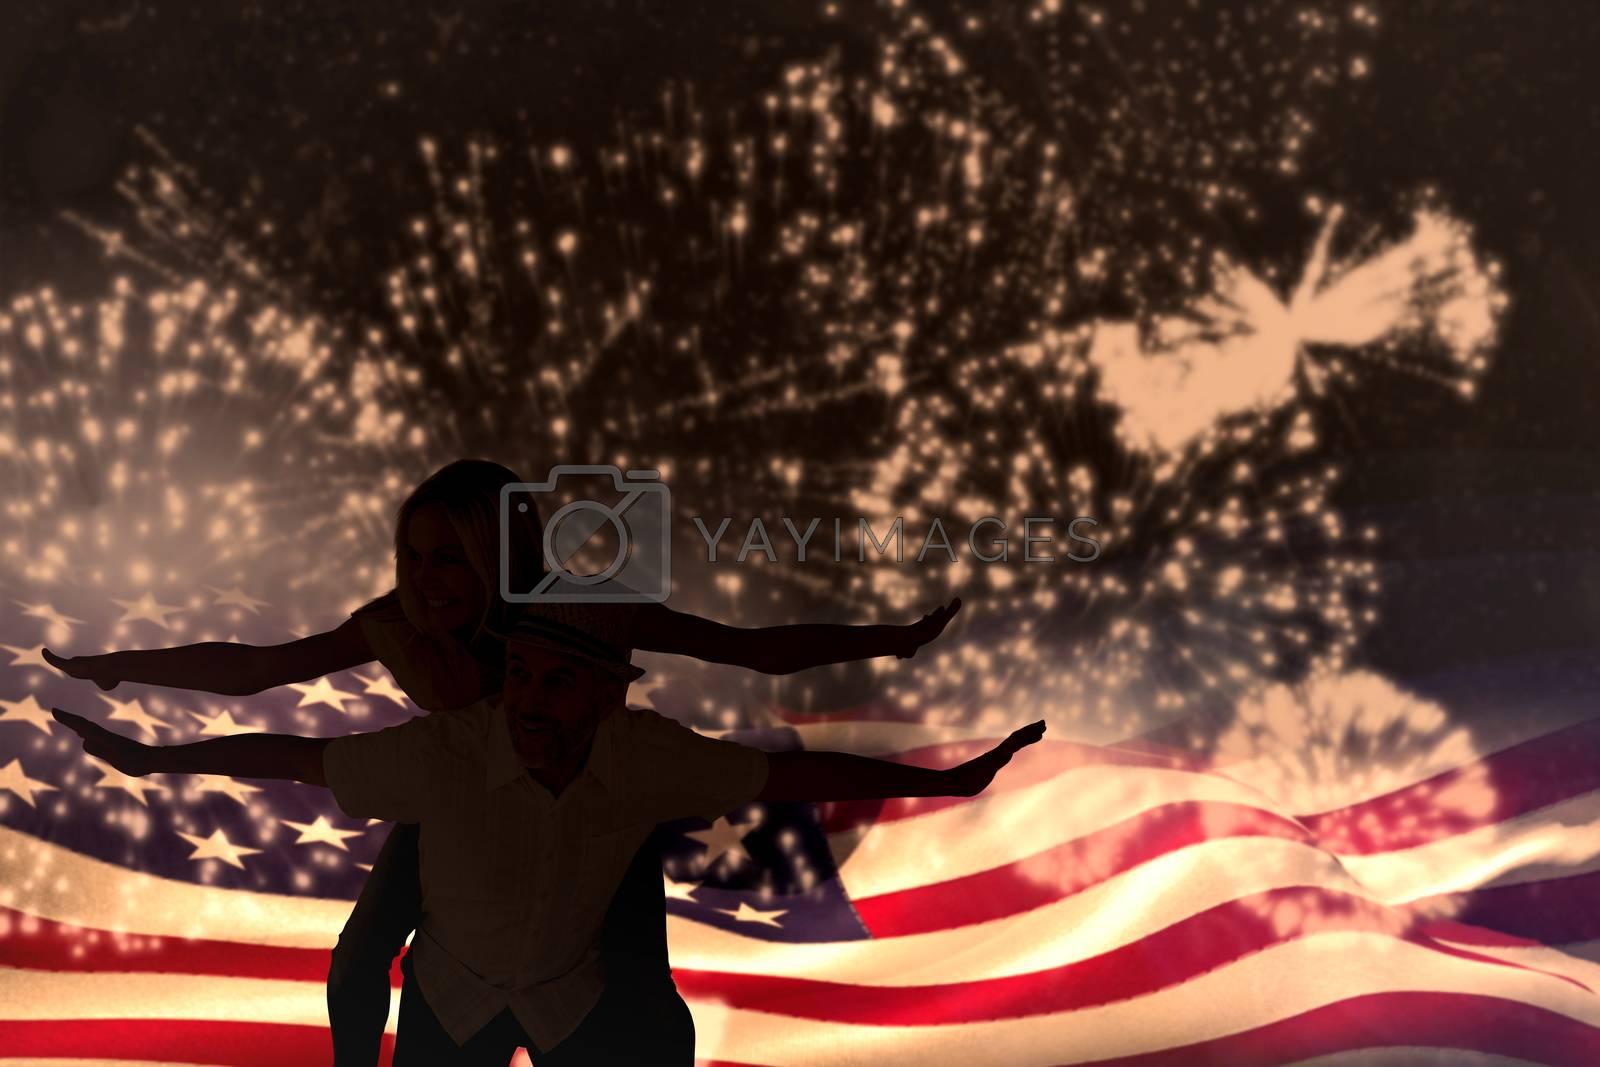 Happy man giving his partner a piggy back against white fireworks exploding on black background